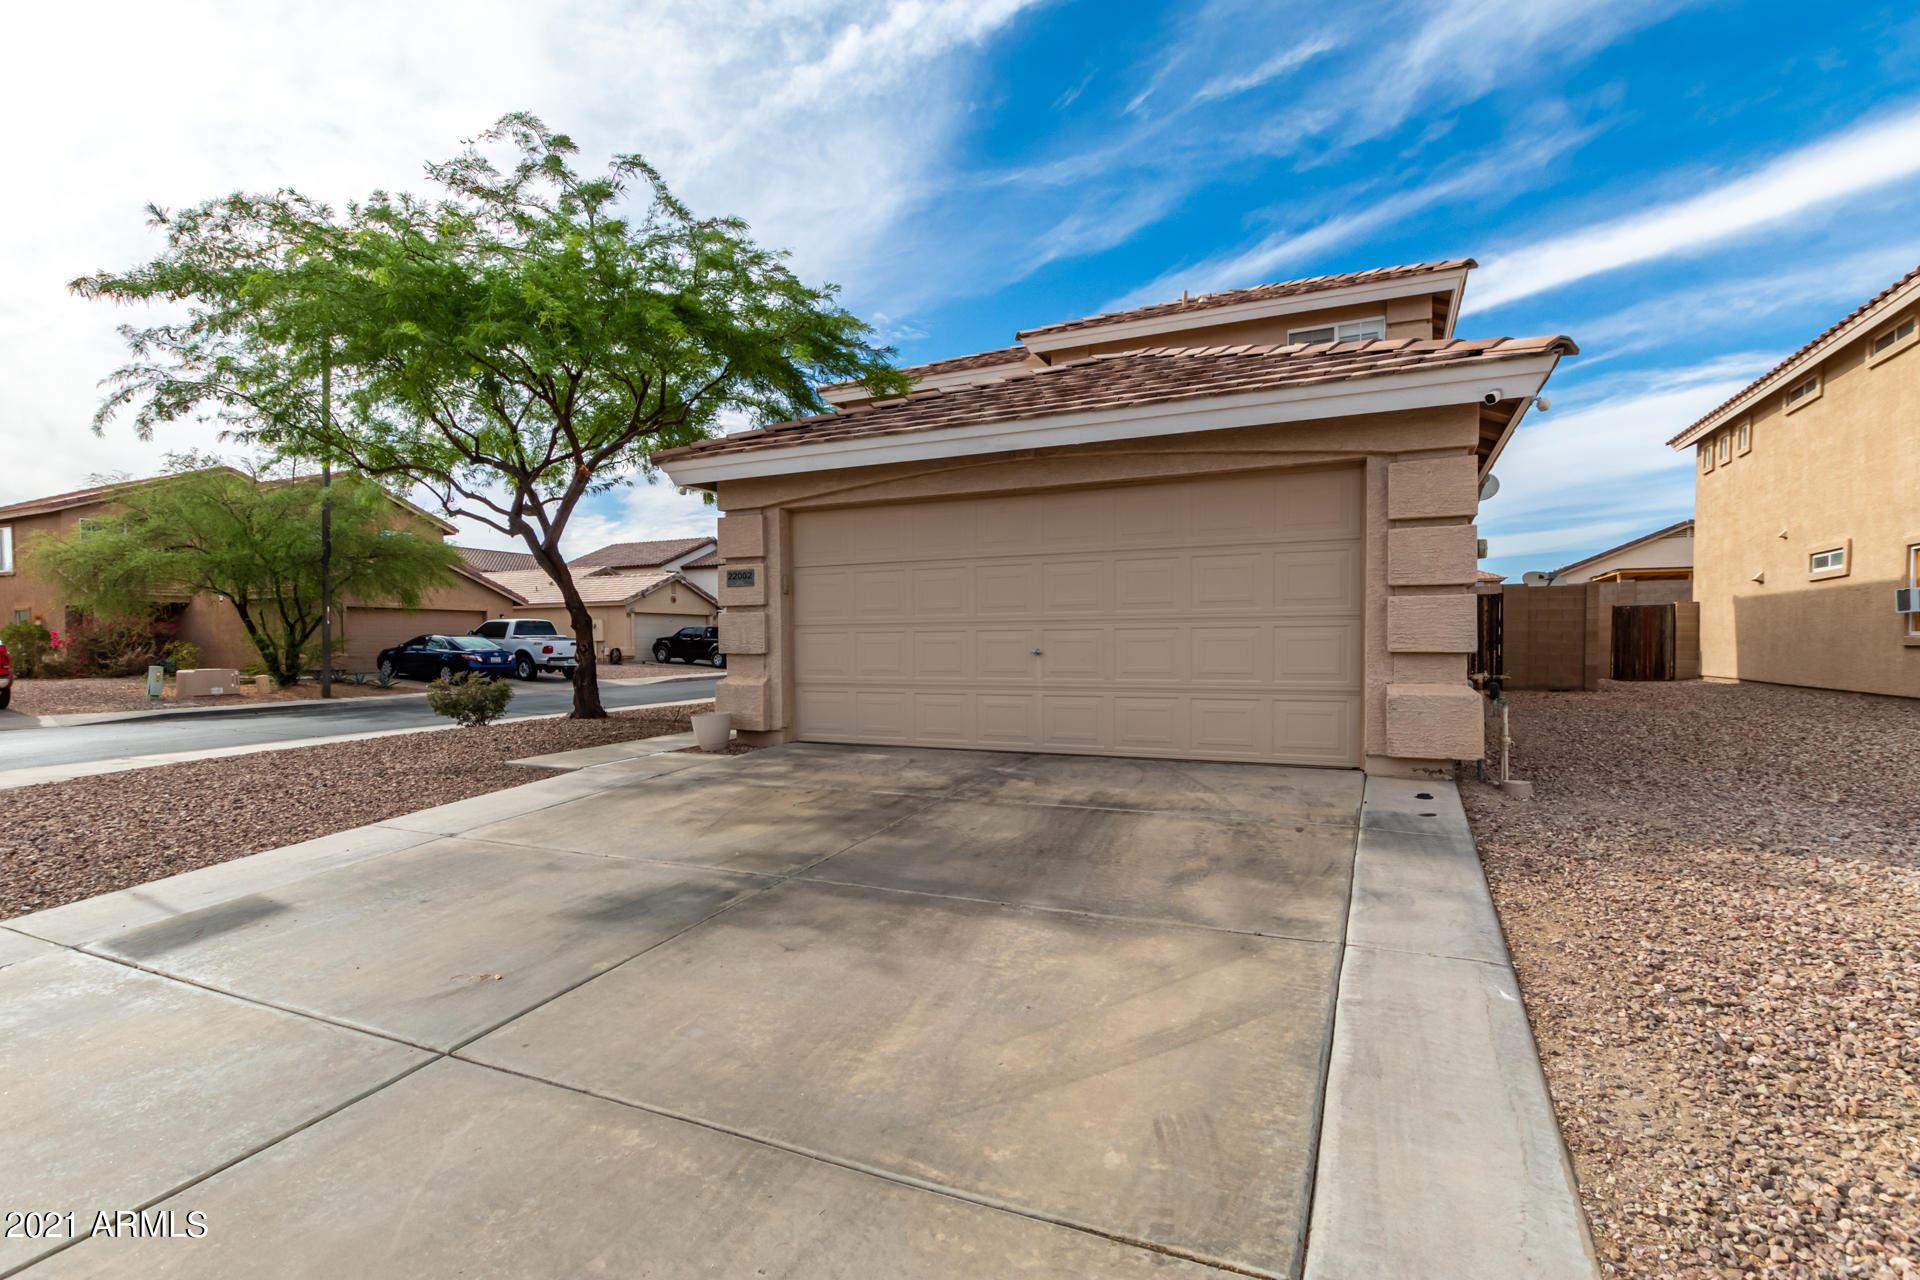 Photo of 22002 W CASEY Lane, Buckeye, AZ 85326 (MLS # 6248409)